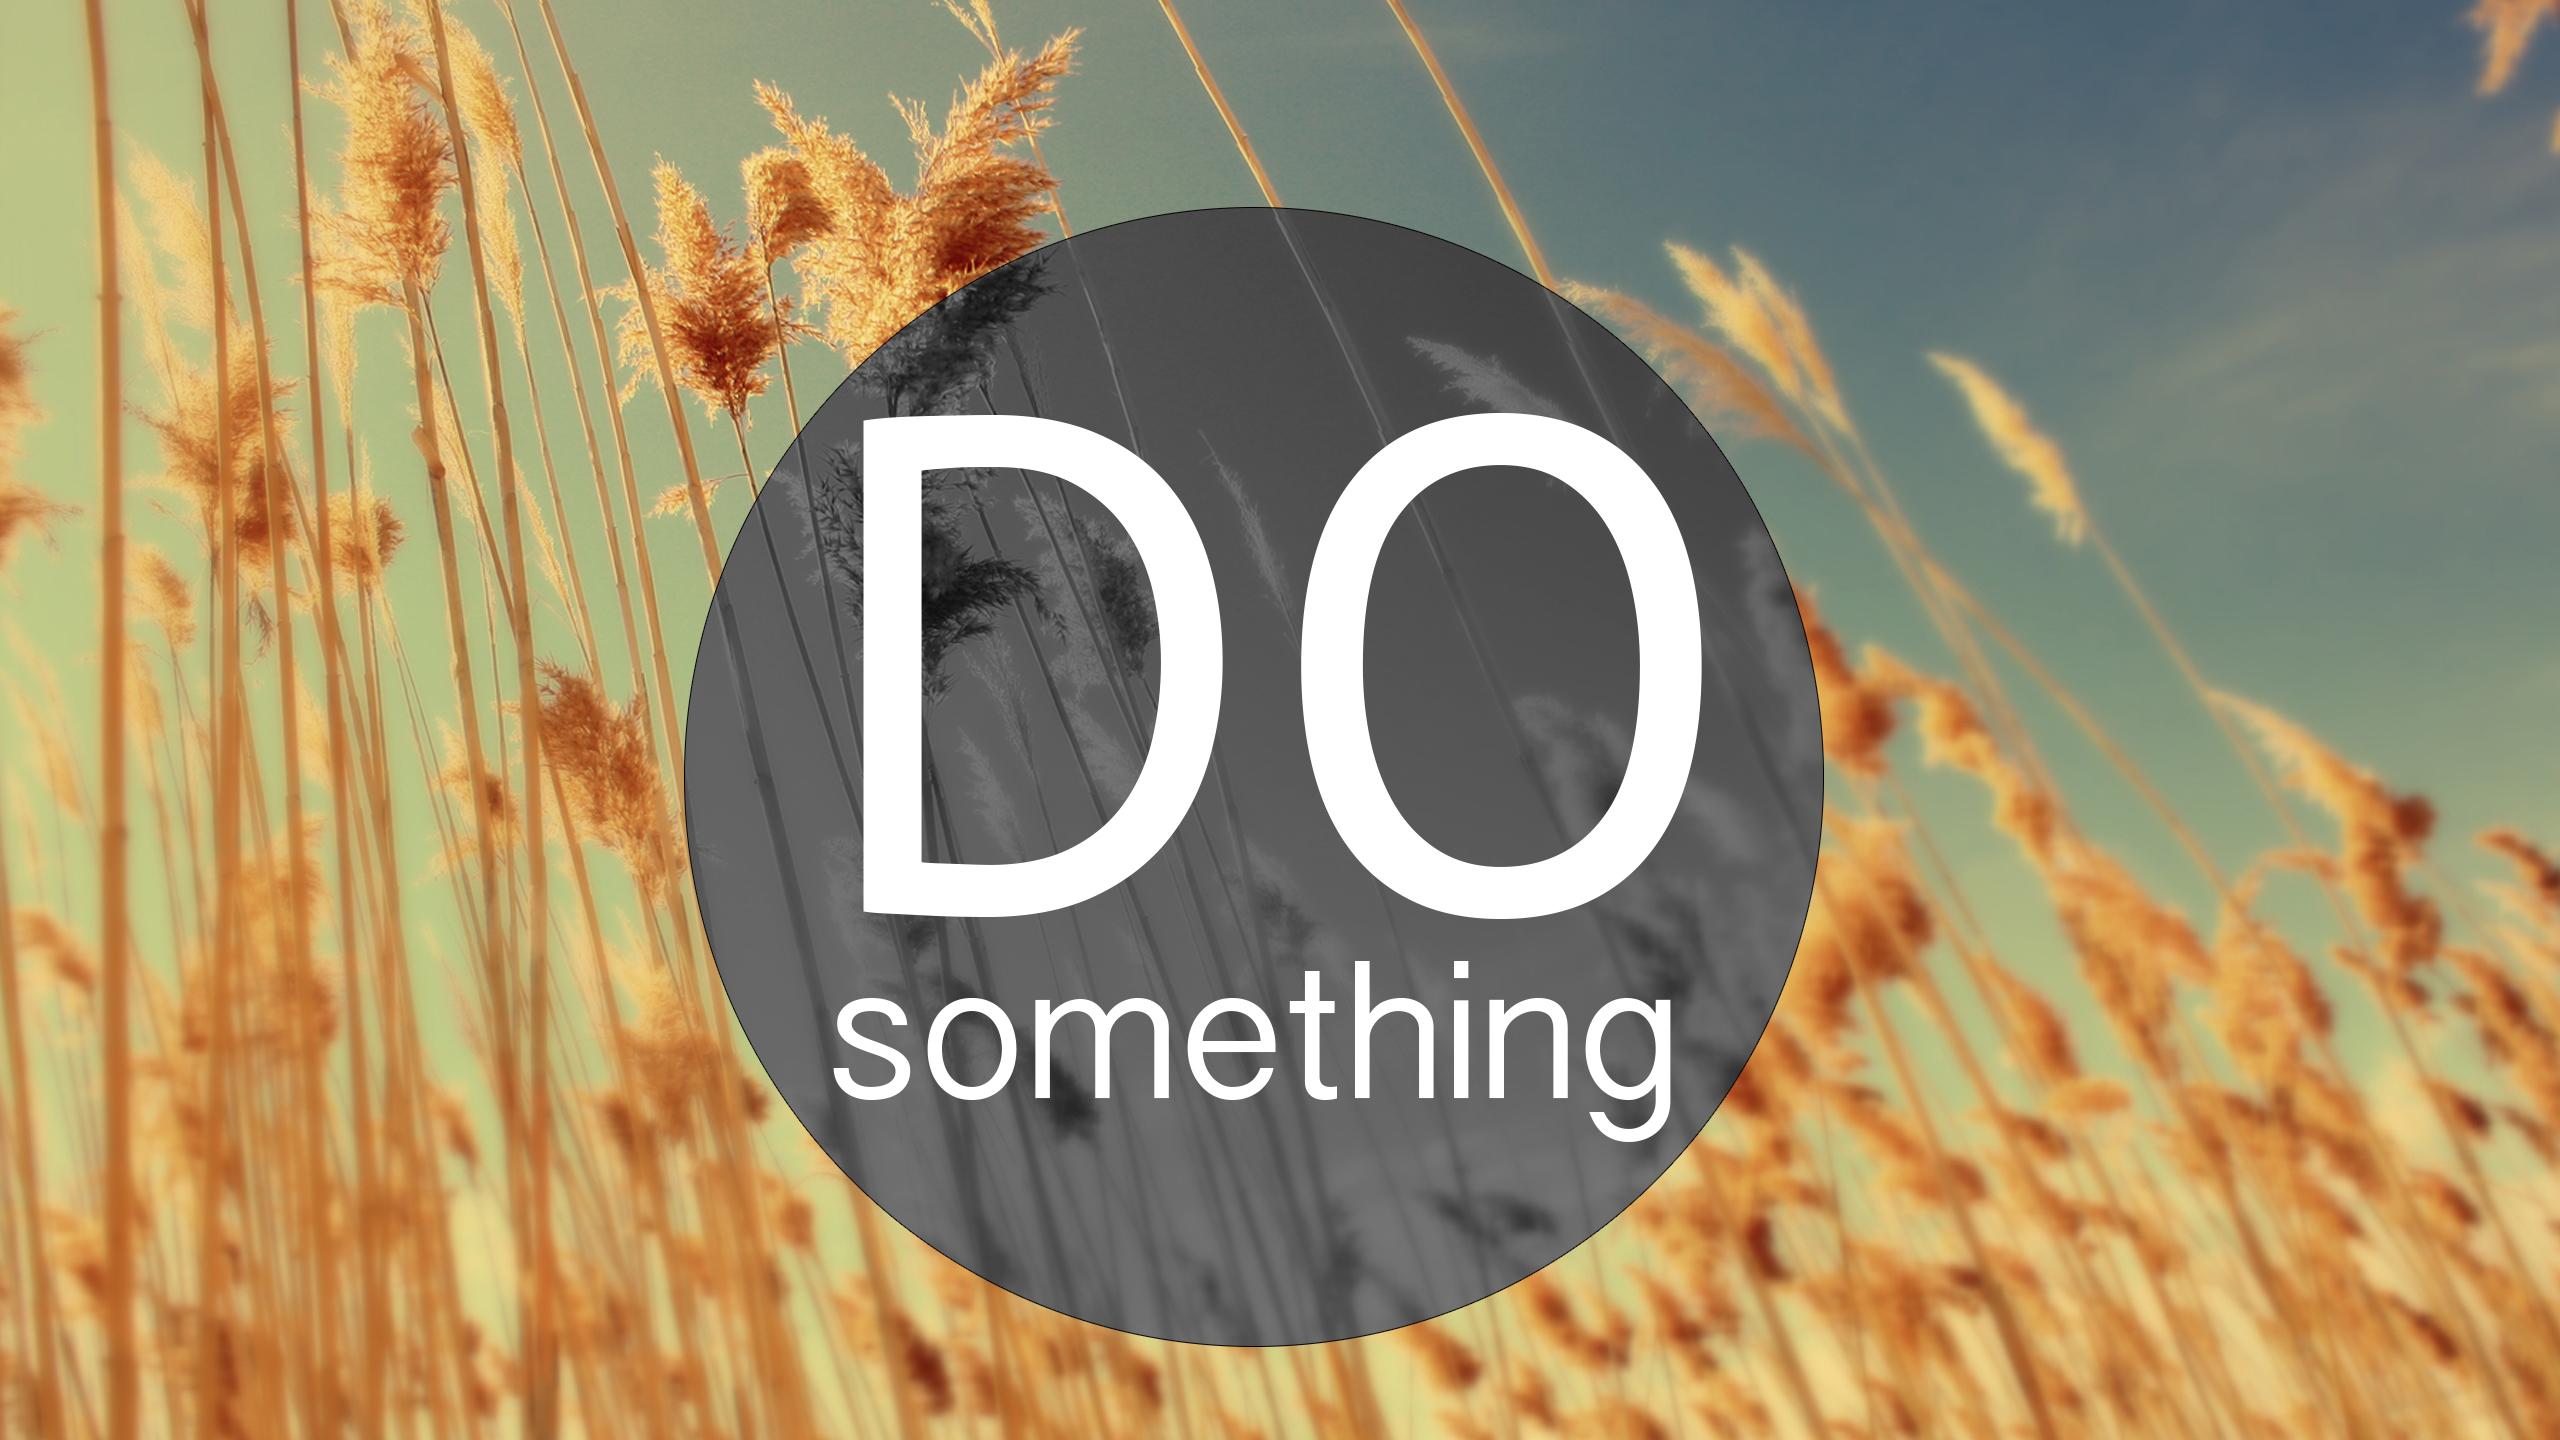 do_something_hd_wallpaper_by_vtahlick-d5szt4j